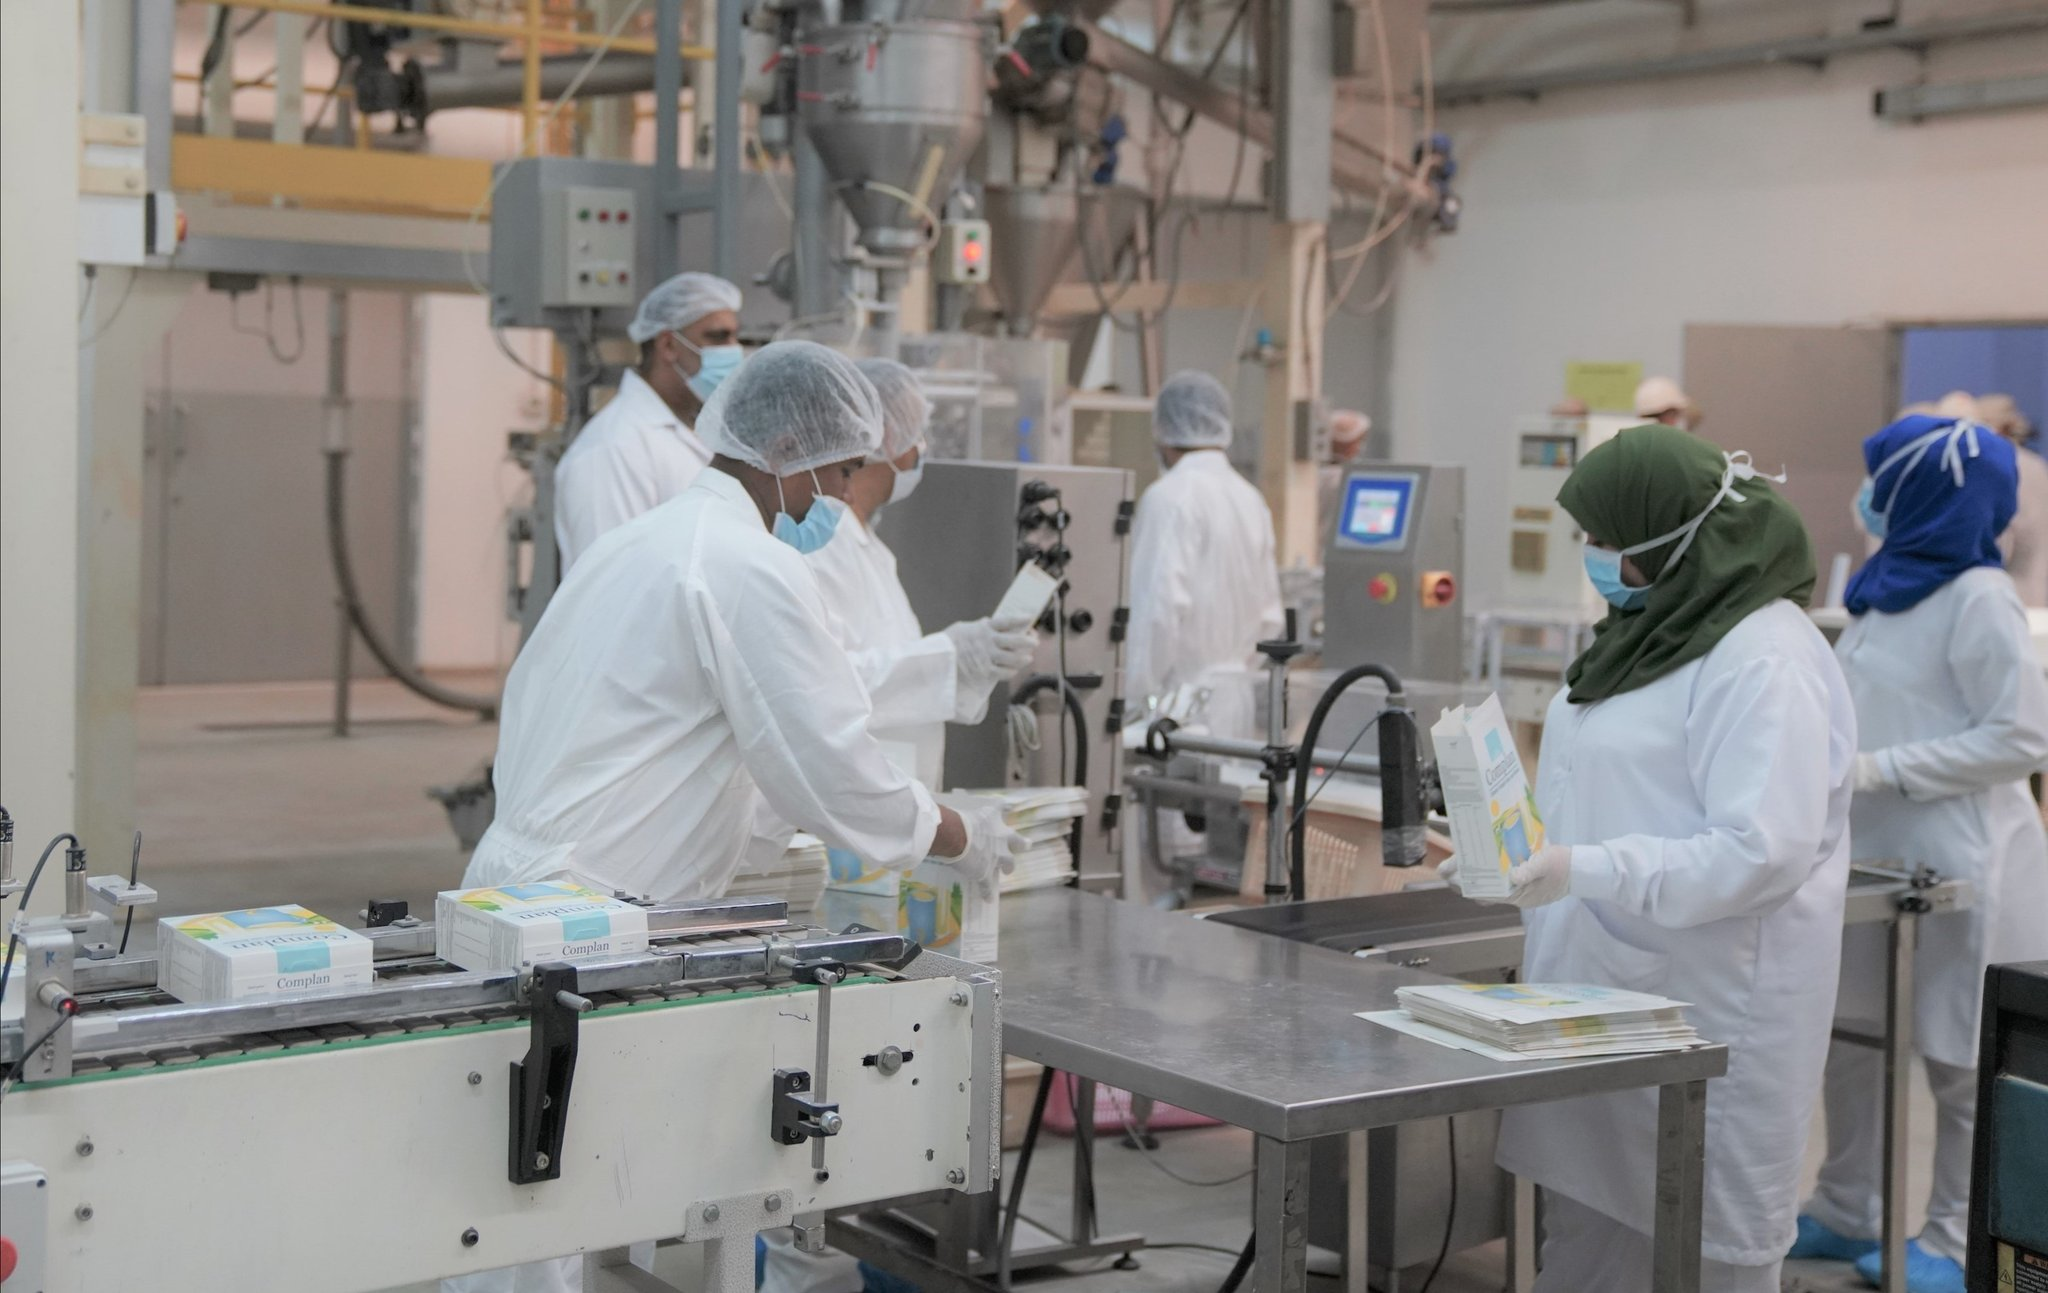 Over OMR 2 billion invested in Sohar Industrial City last year